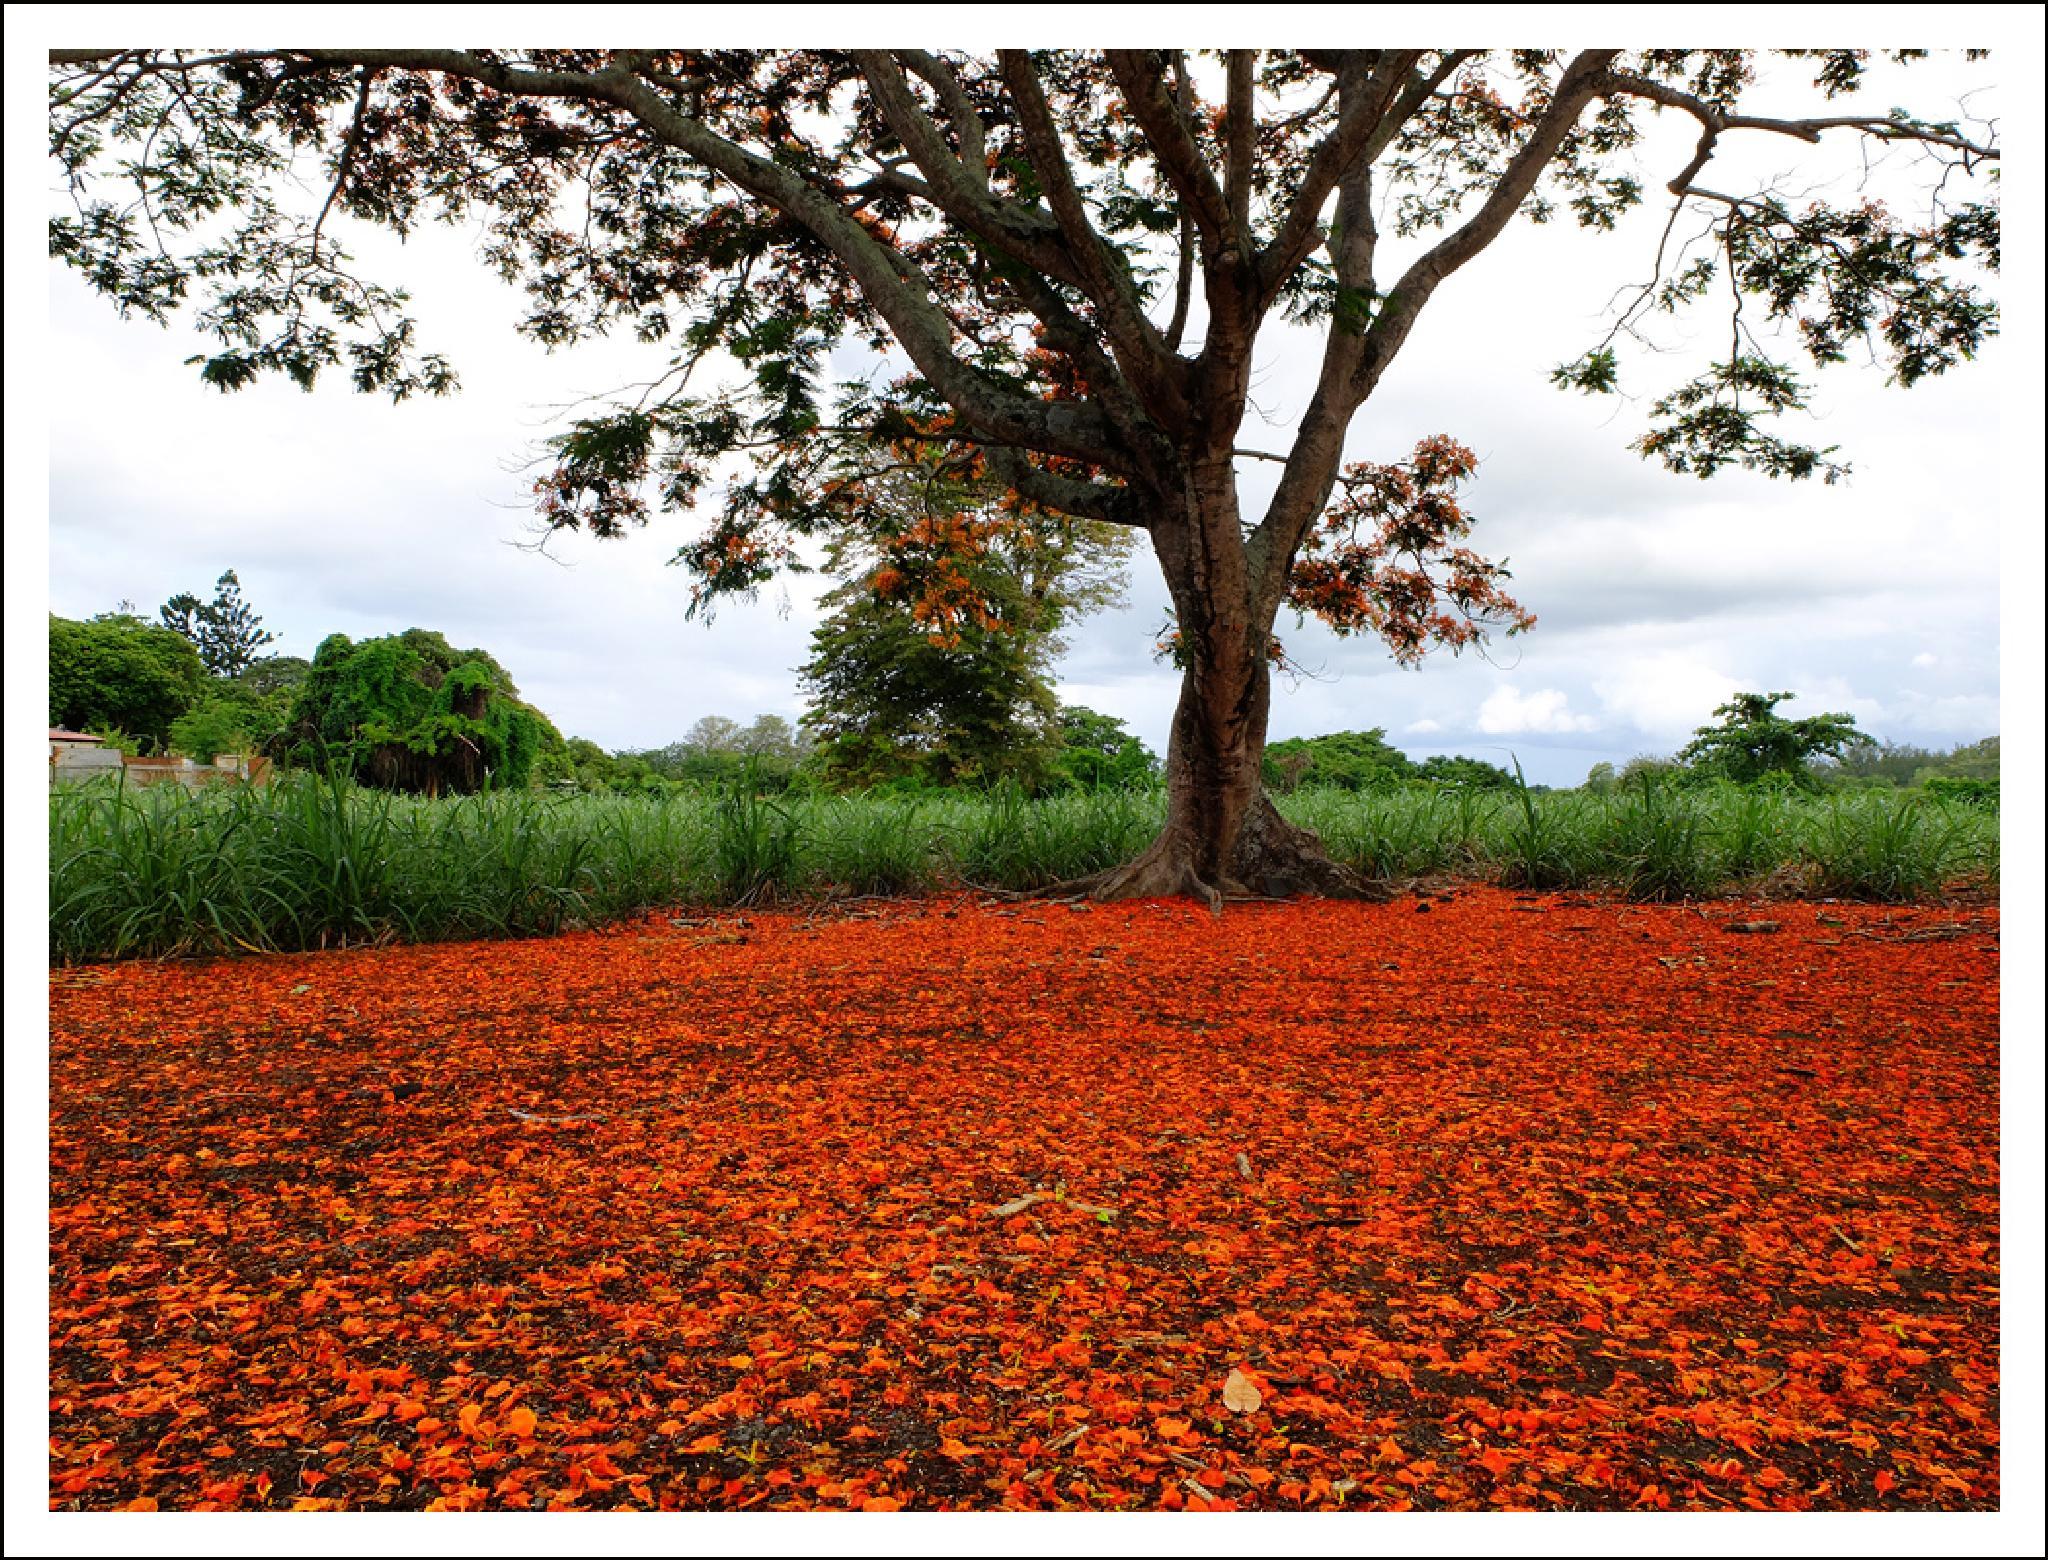 The Flame Tree by Ali Hoolash